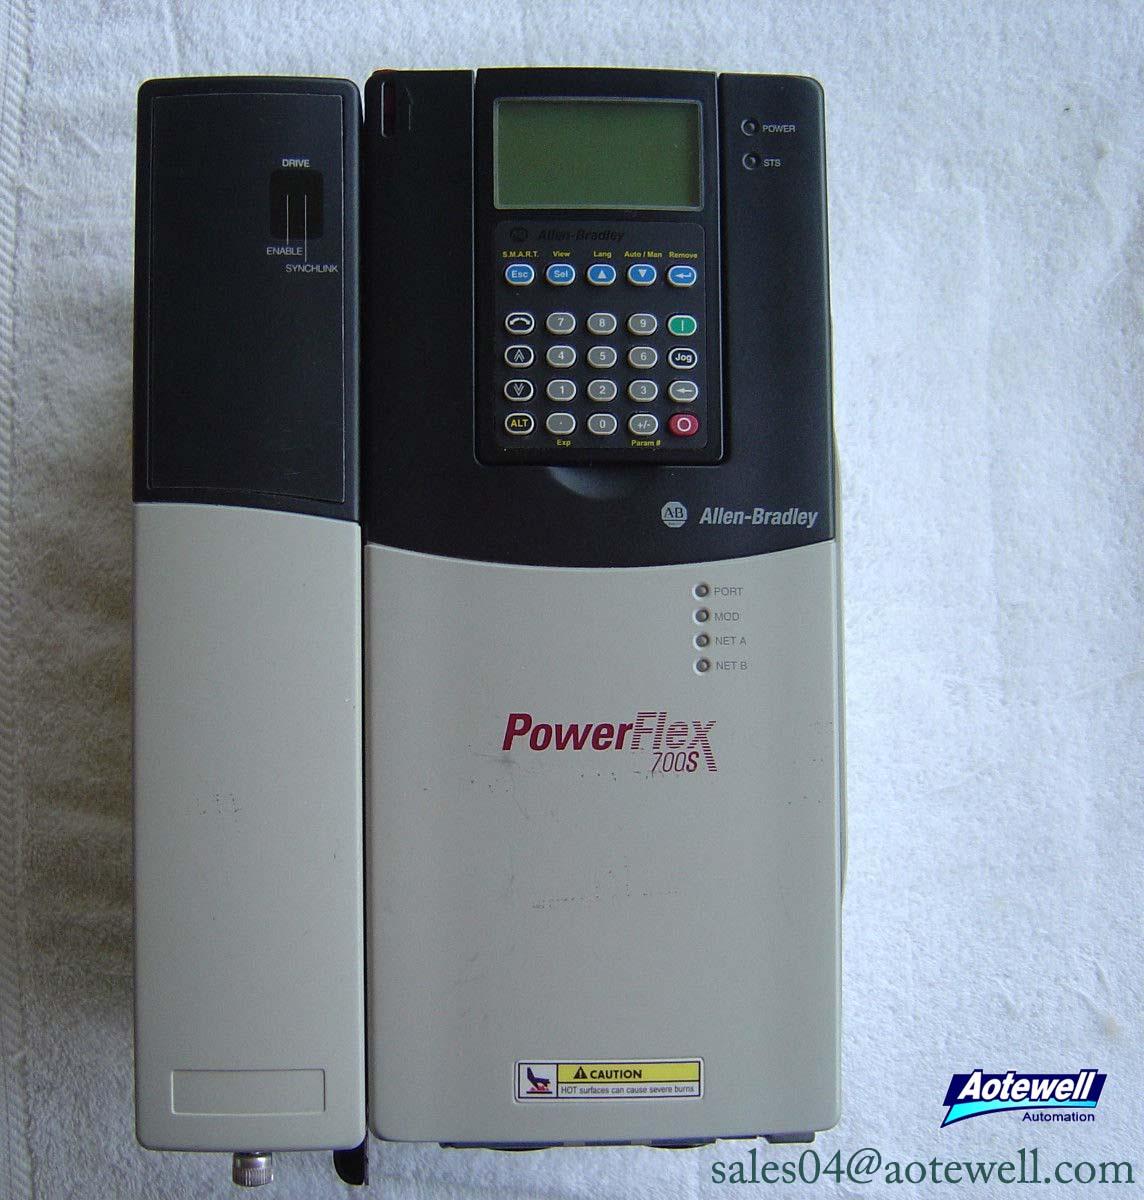 Allen Bradley PowerFlex 700S AC Drives Series 20DB015A0EYNANANE 20DB022A0EYNANANE